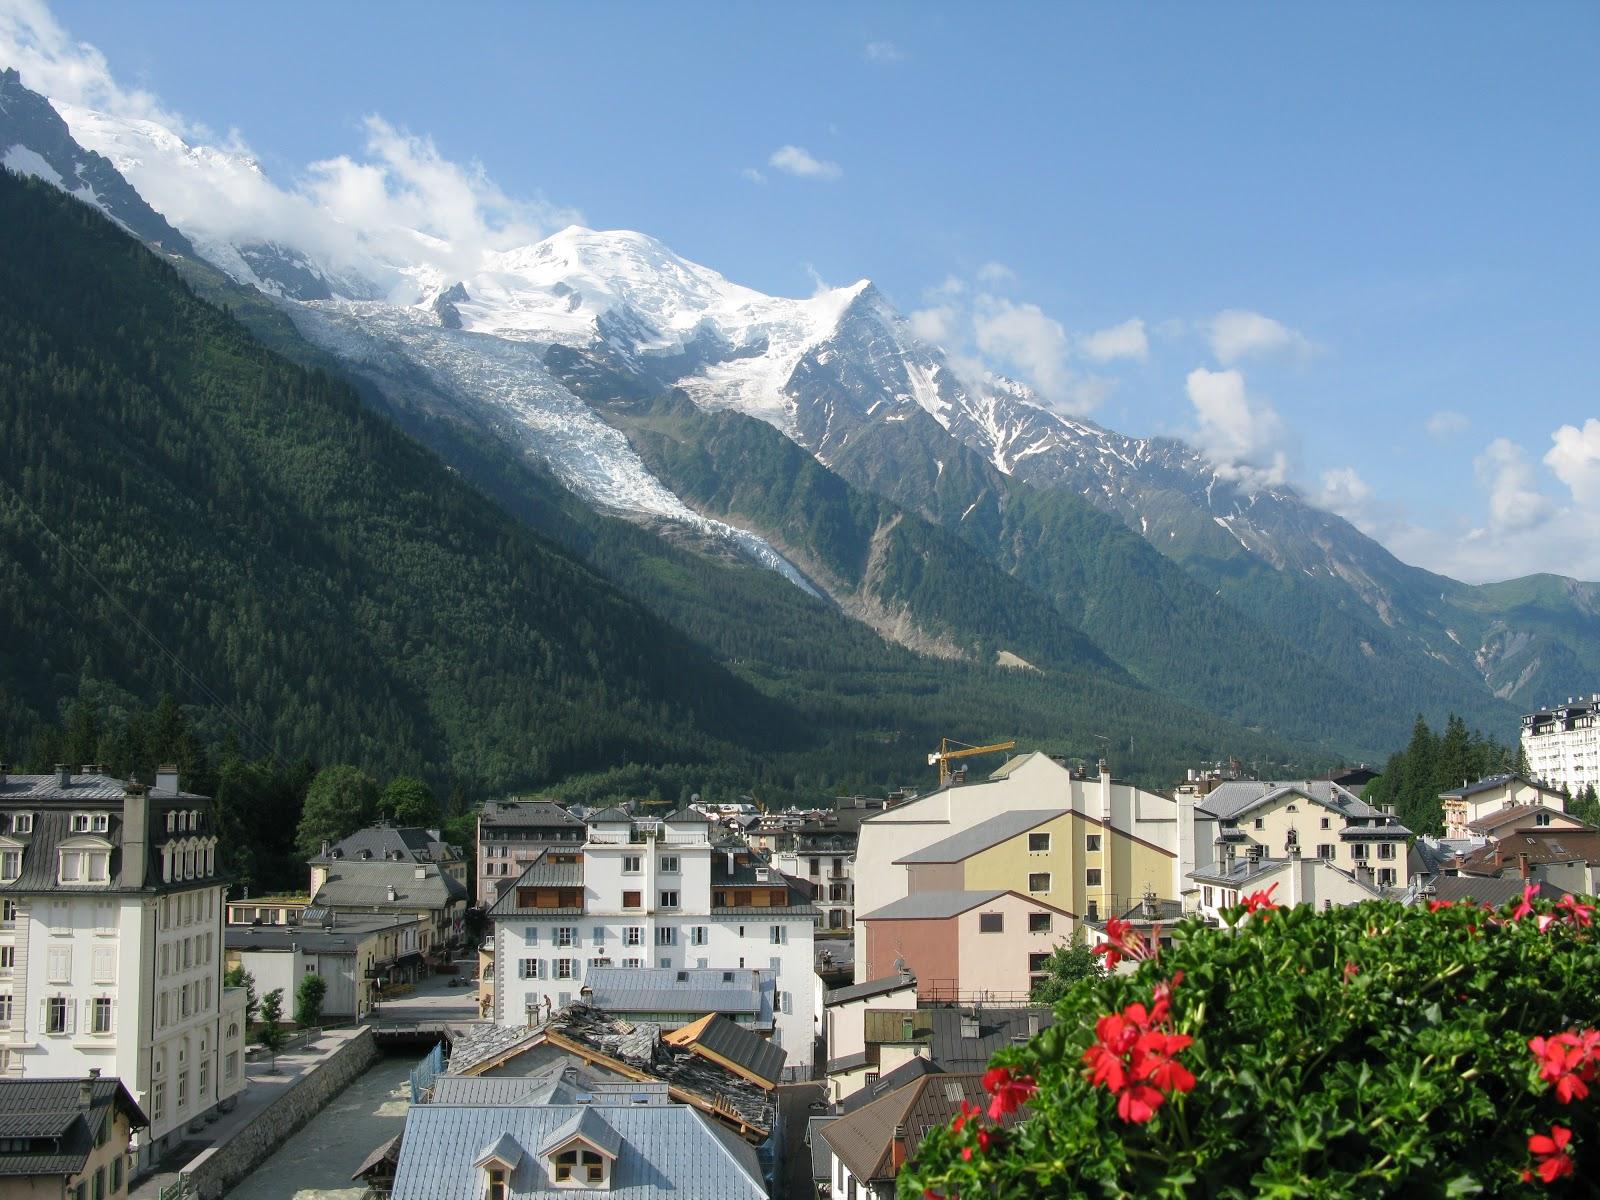 TOP WORLD TRAVEL DESTINATIONS: Chamonix, France